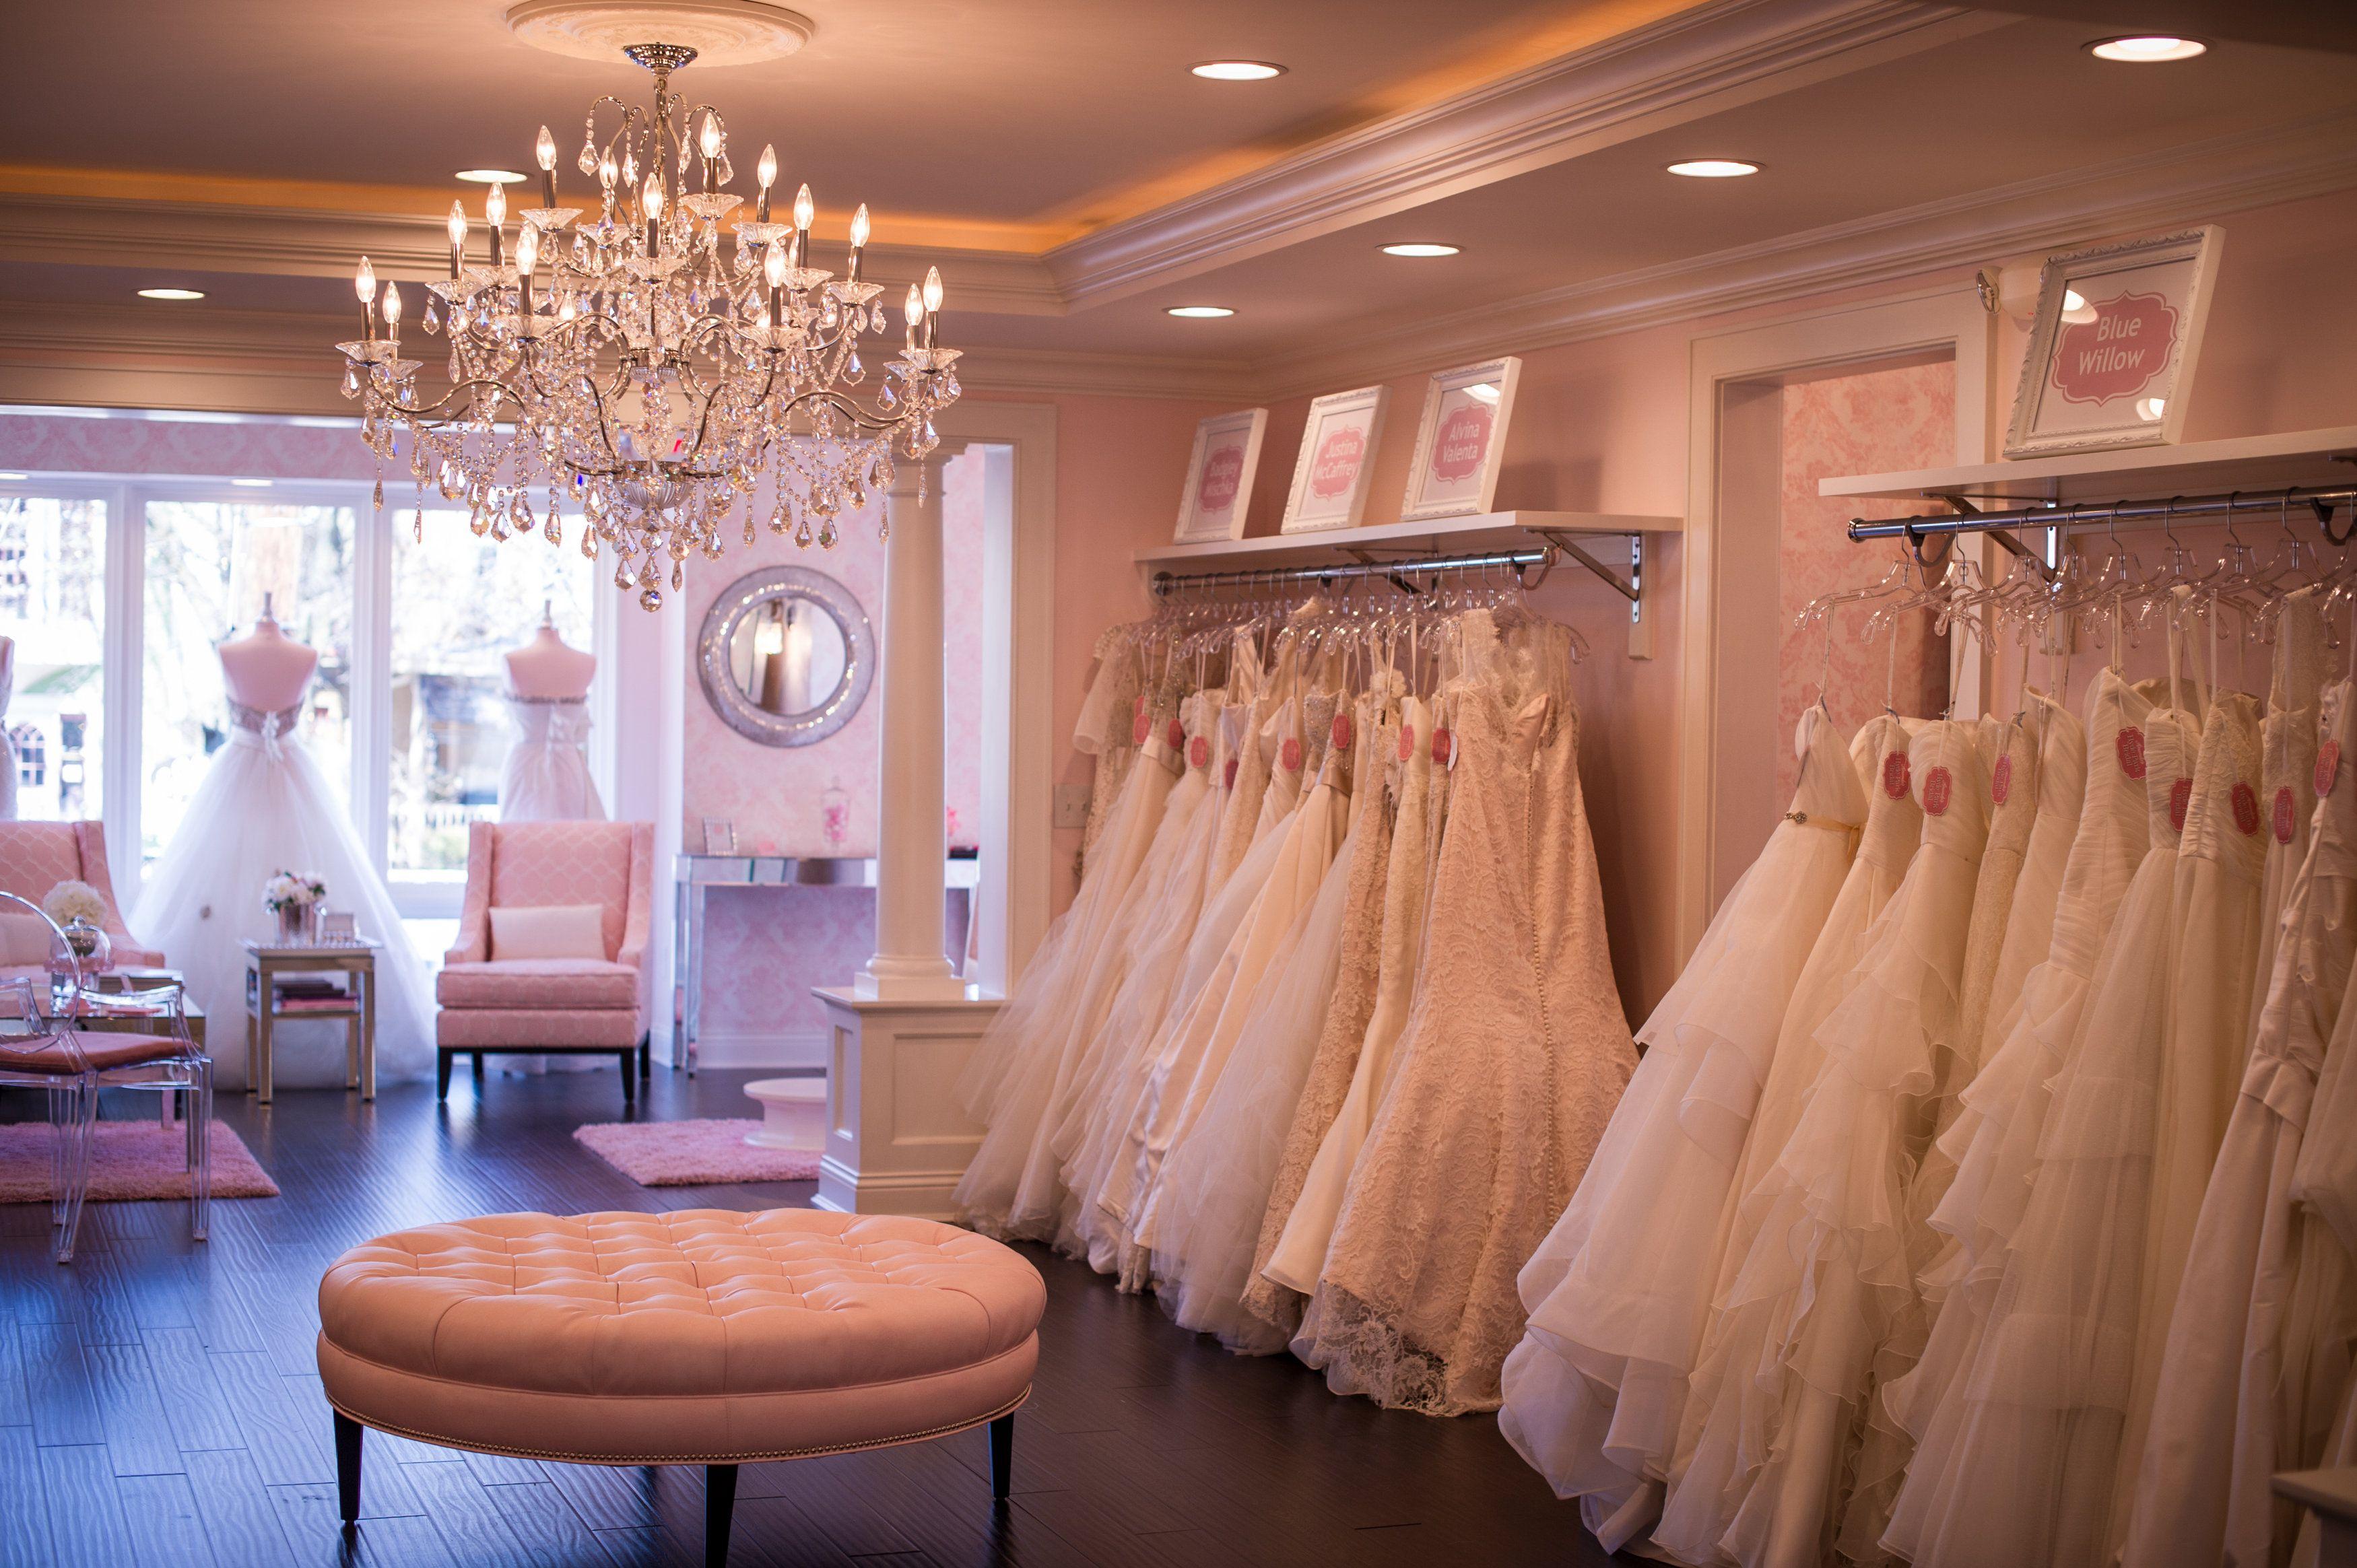 Hyde park bridal boutique cincinnati oh hydeparkbridal for Disenos para boutique